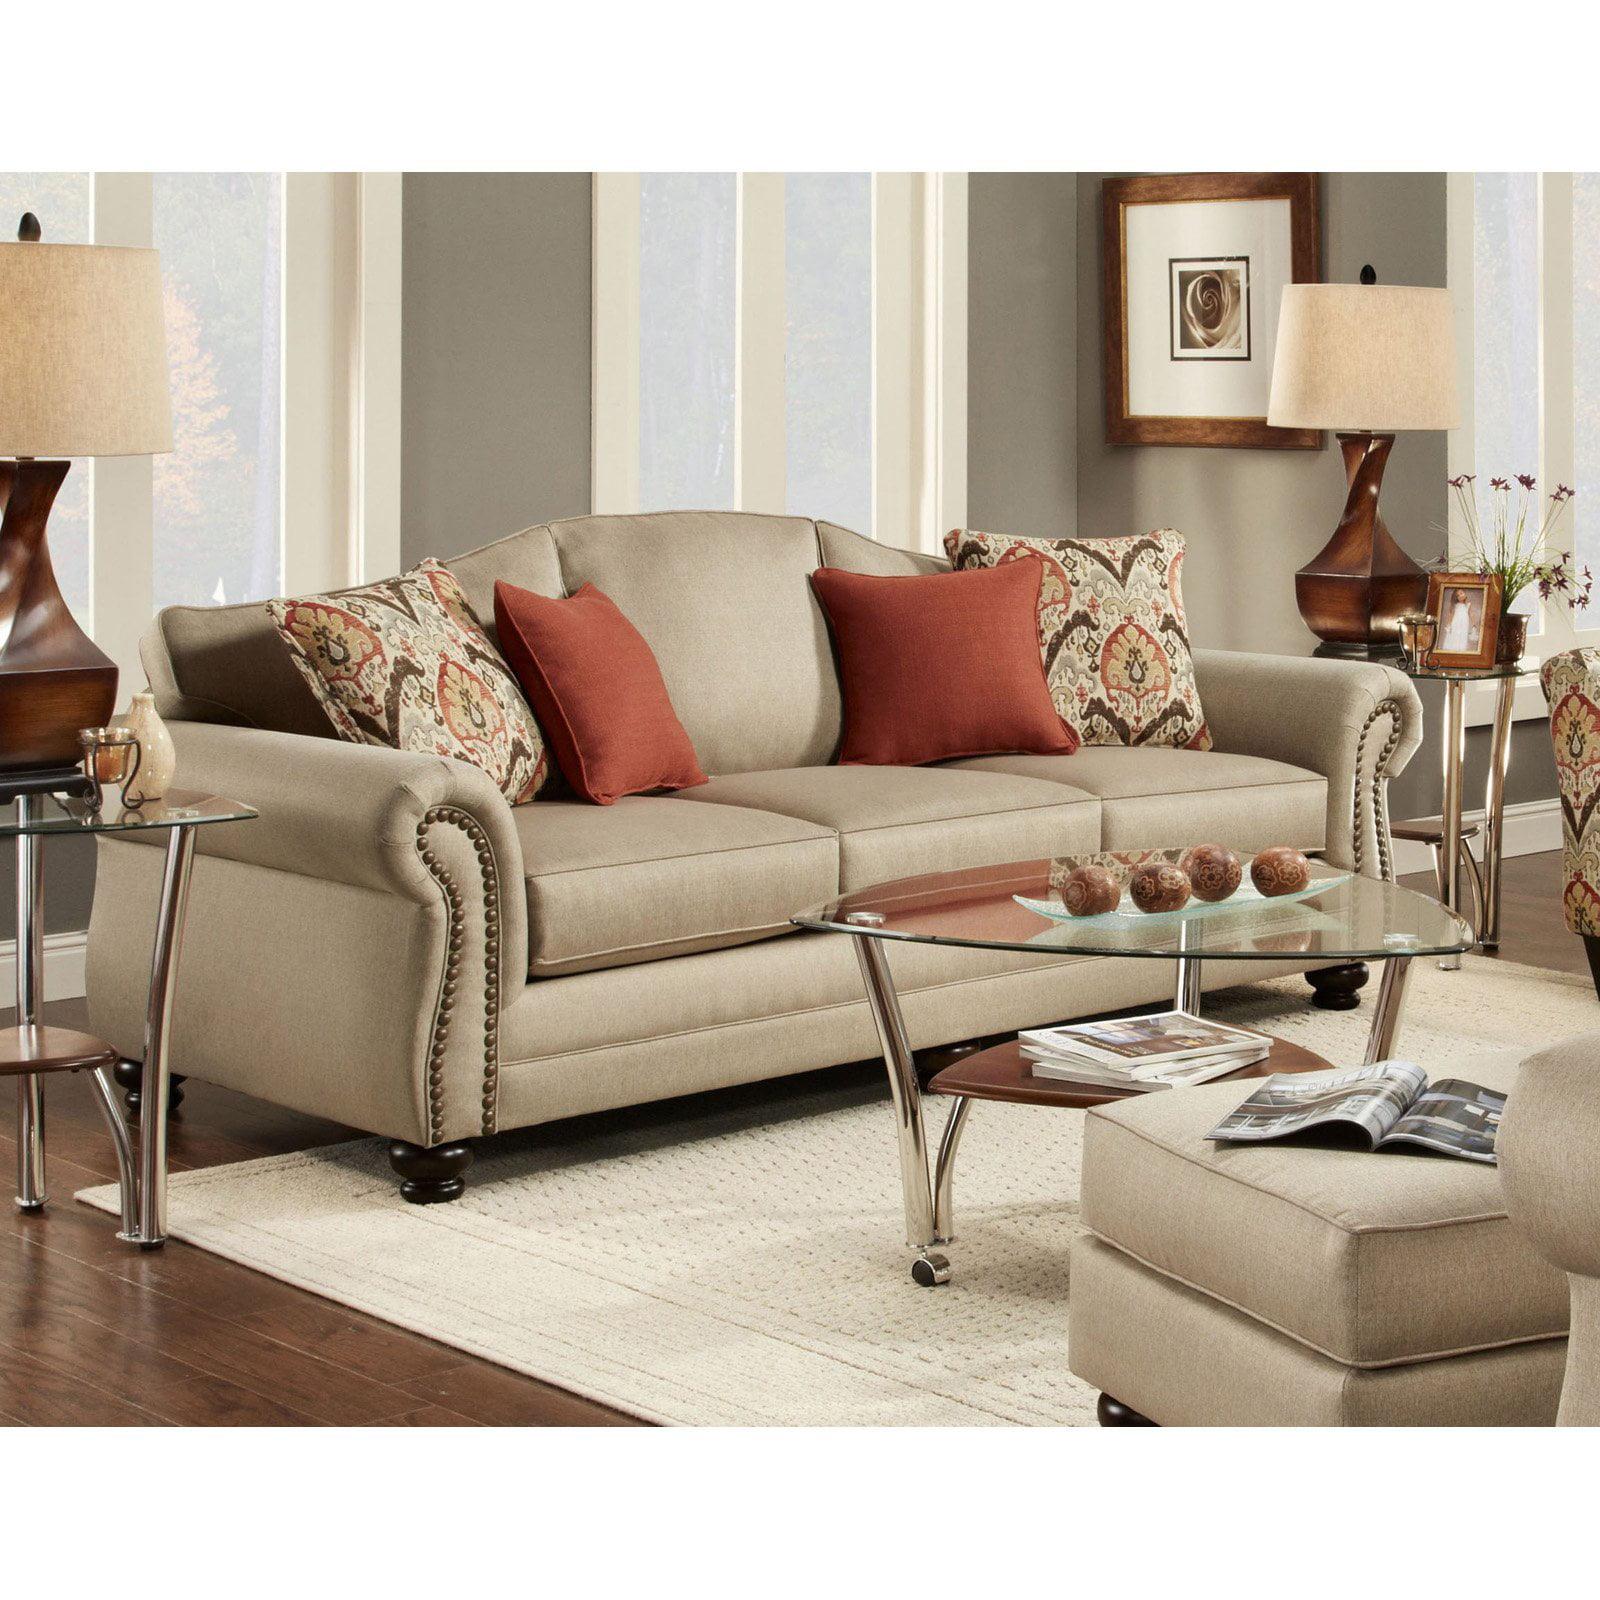 Chelsea Home Furniture Brindisi Sofa Walmart Com